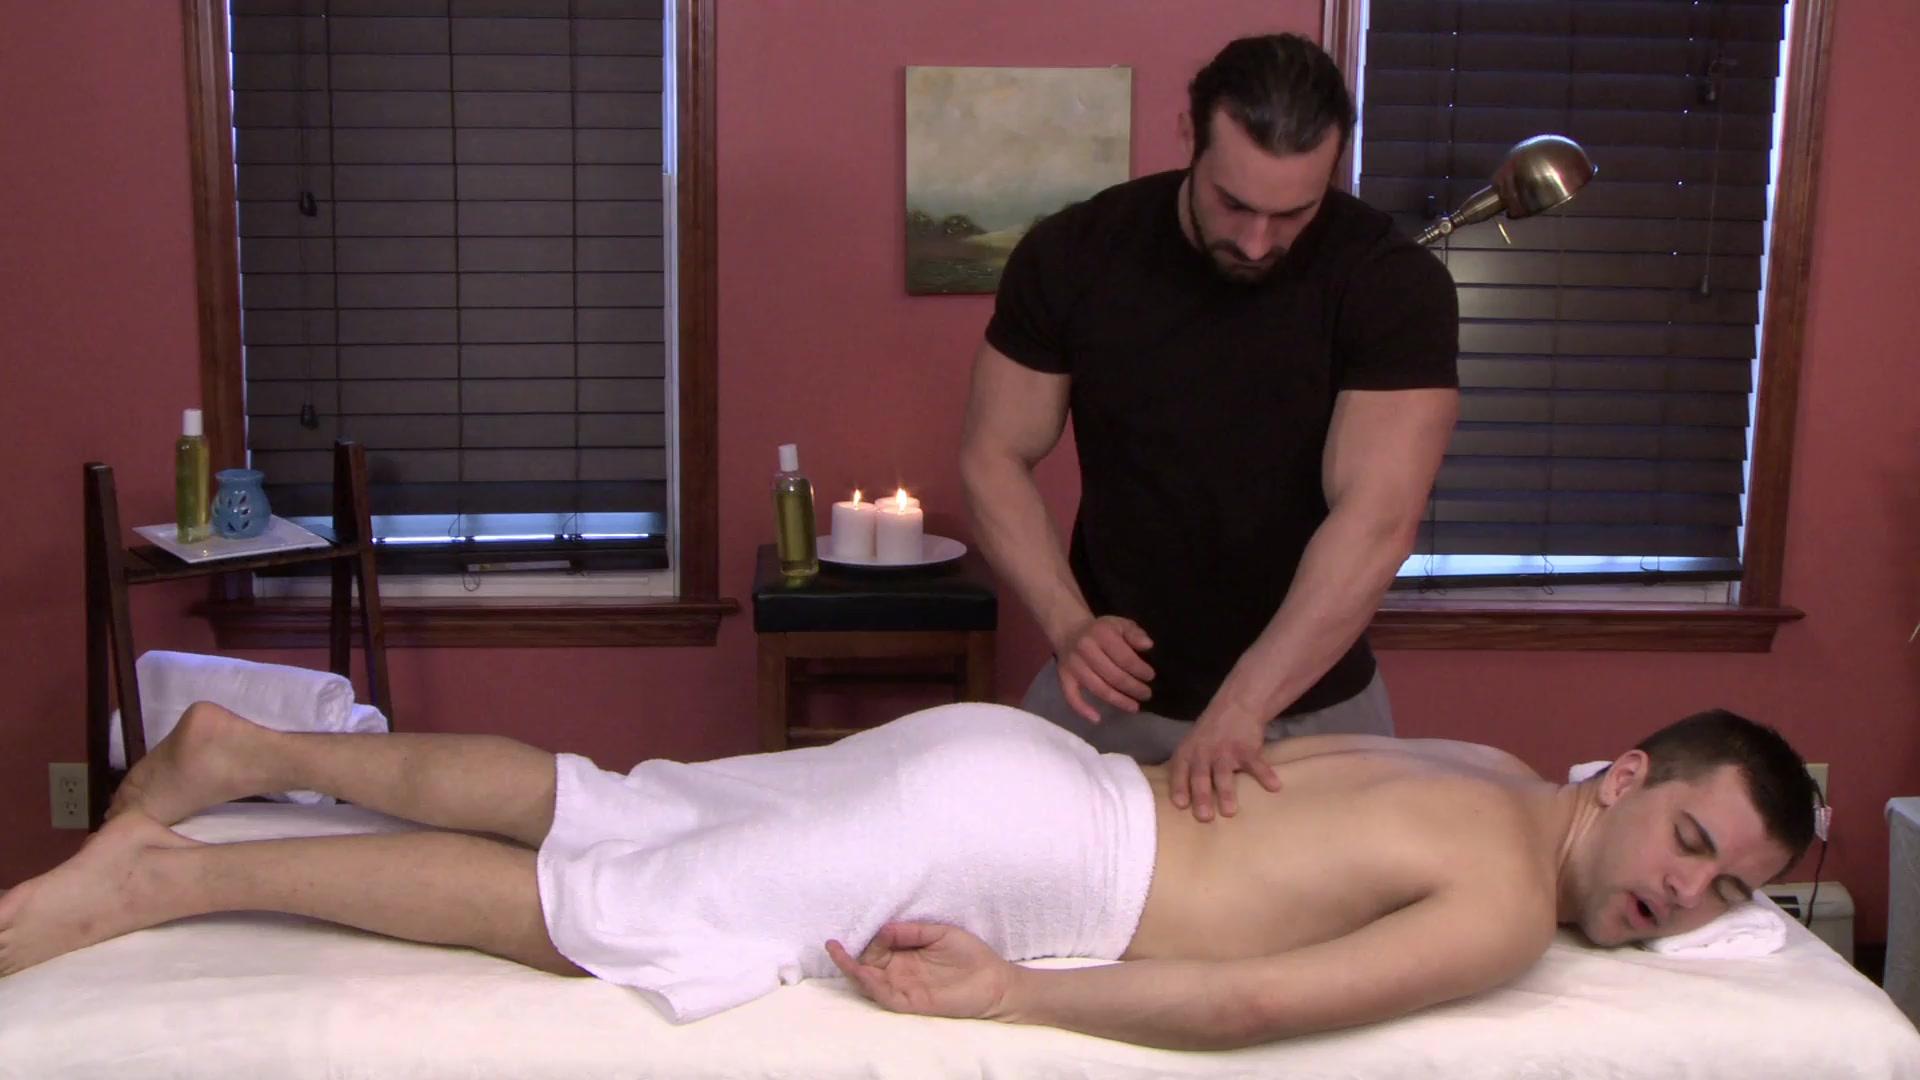 Steve borges massage therapist